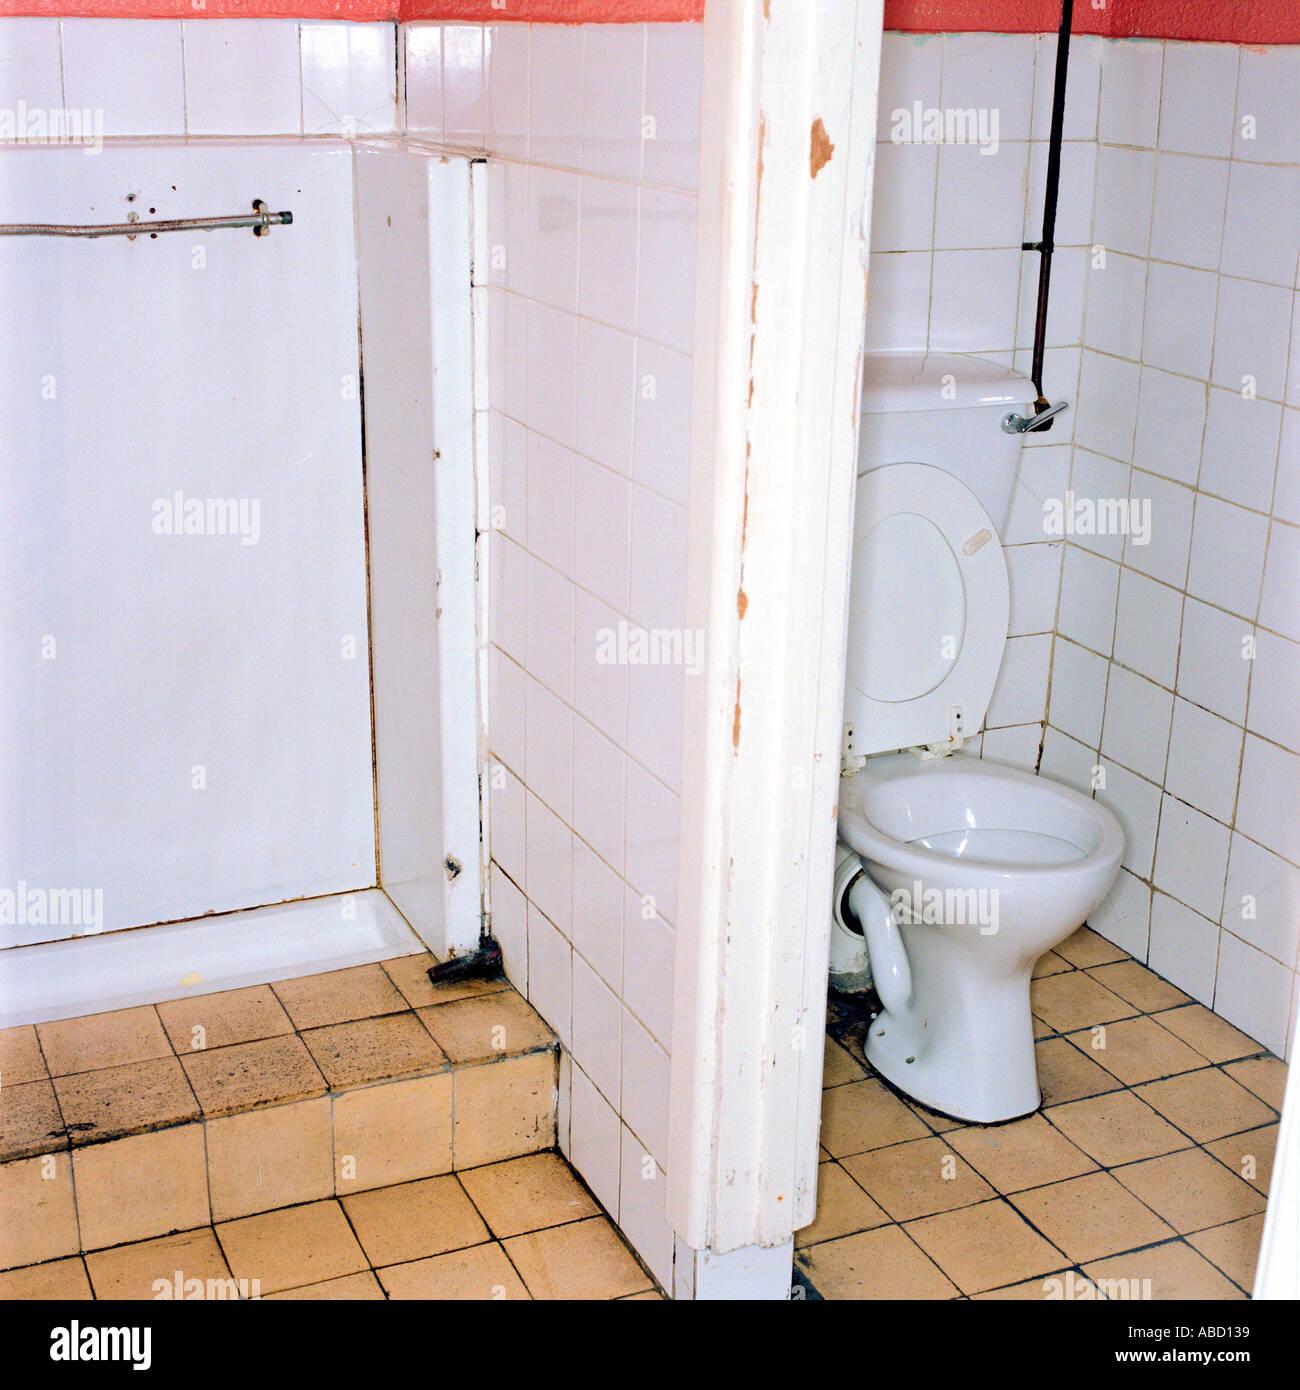 Womens Public Bathroom Toilet Video: Dirty Toilet Stock Photos & Dirty Toilet Stock Images